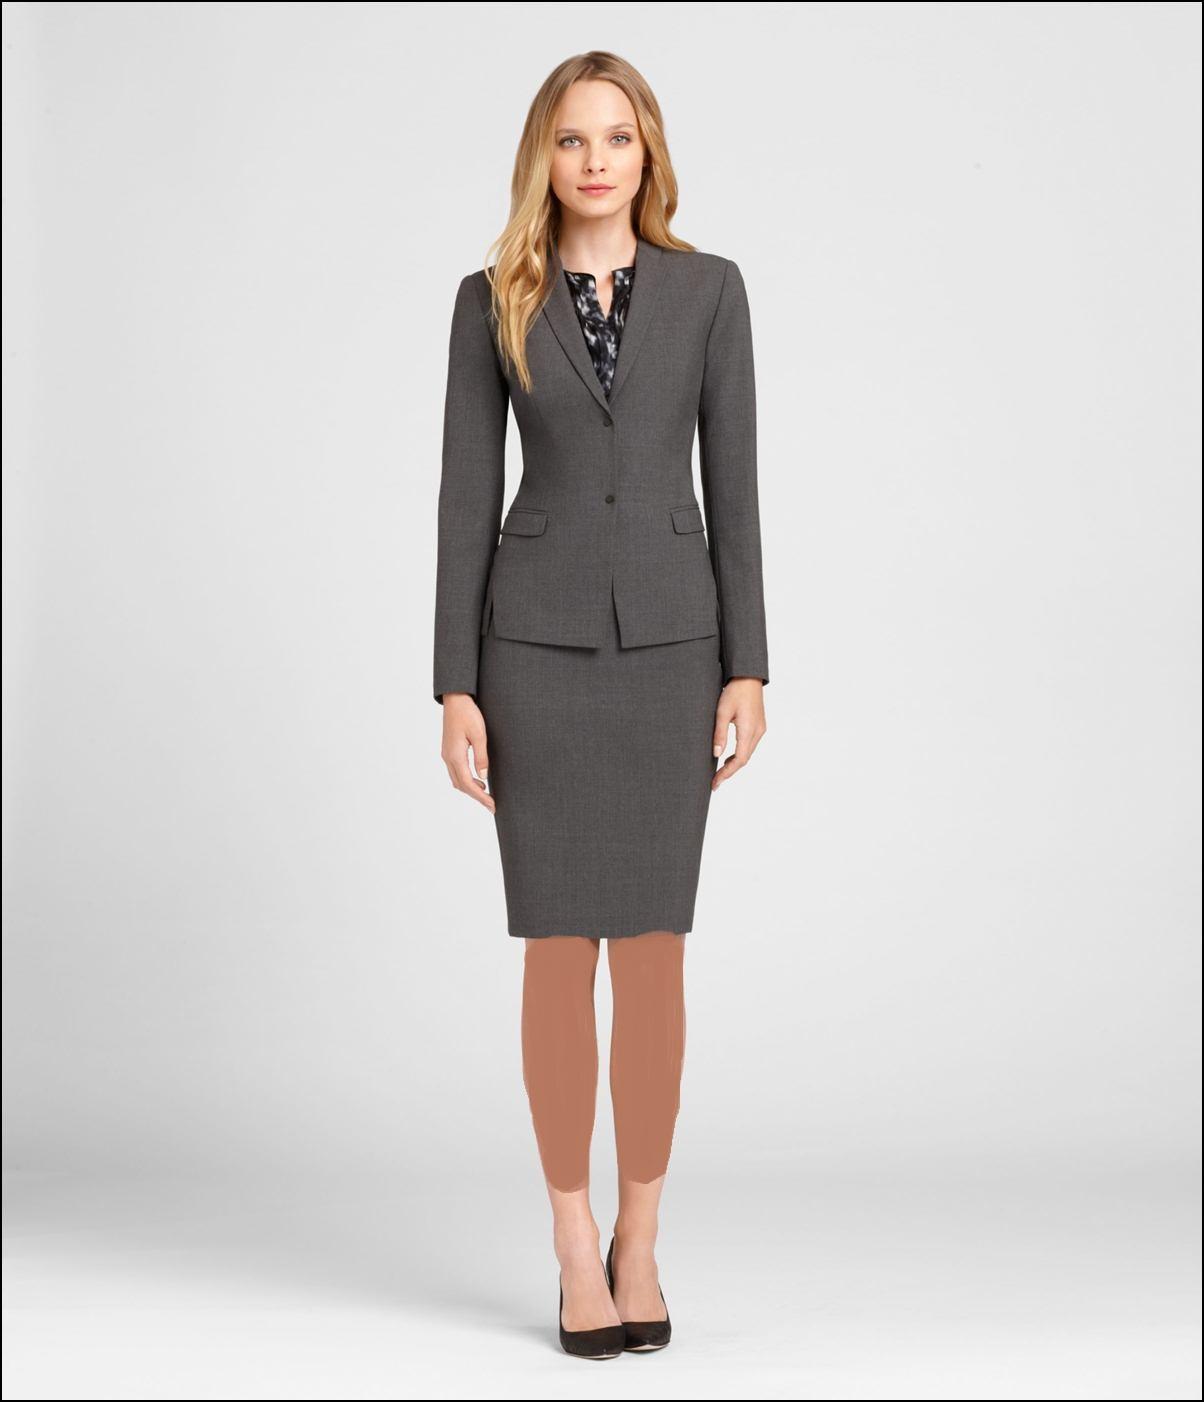 http://www.uplooder.net/img/image/69/b7e338a9d22b30c6f64f5c4b9d113e76/Suits-for-Women-Grey.jpg